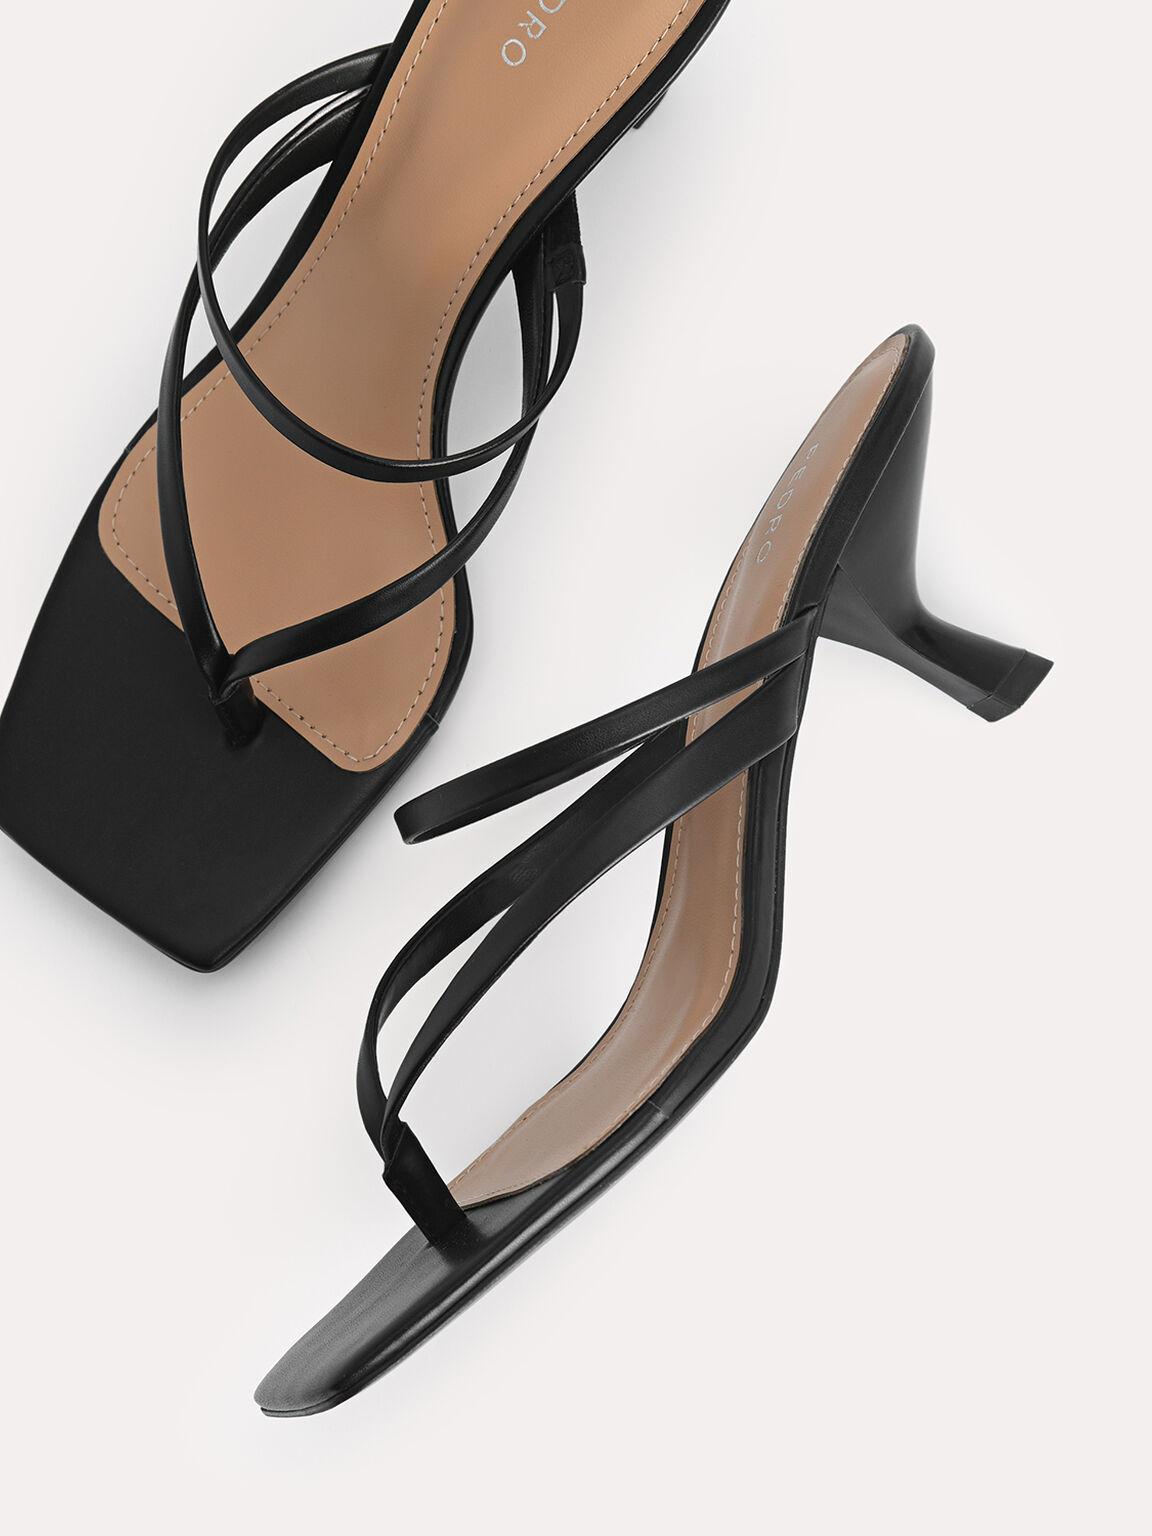 Thong Heeled Sandals, Black, hi-res